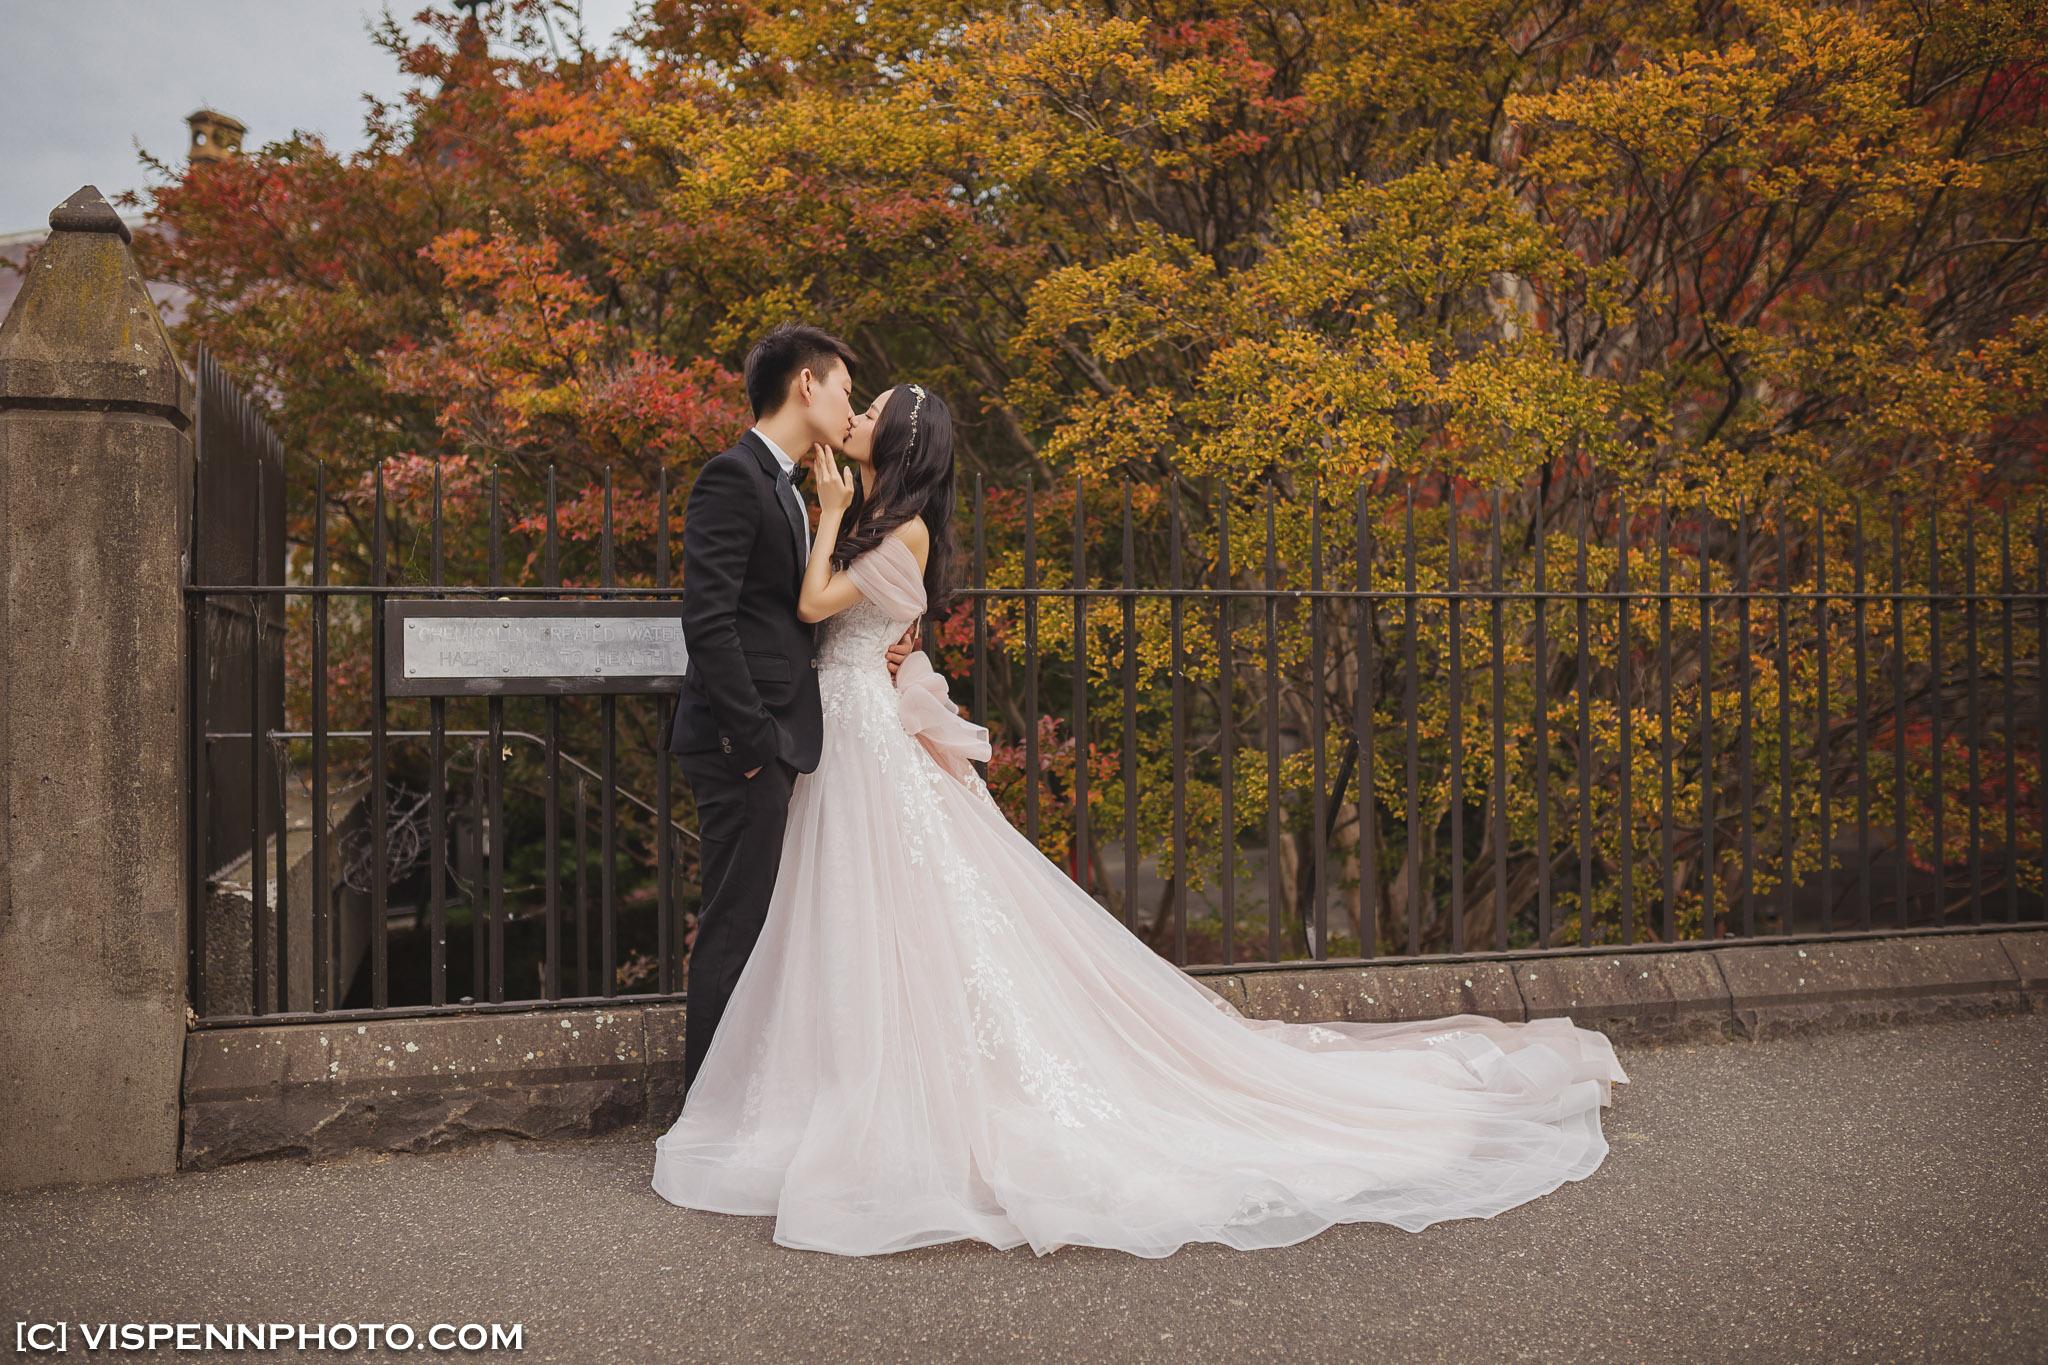 PRE WEDDING Photography Melbourne VISPENN 墨尔本 婚纱照 结婚照 婚纱摄影 VISPENN P5D4 1088